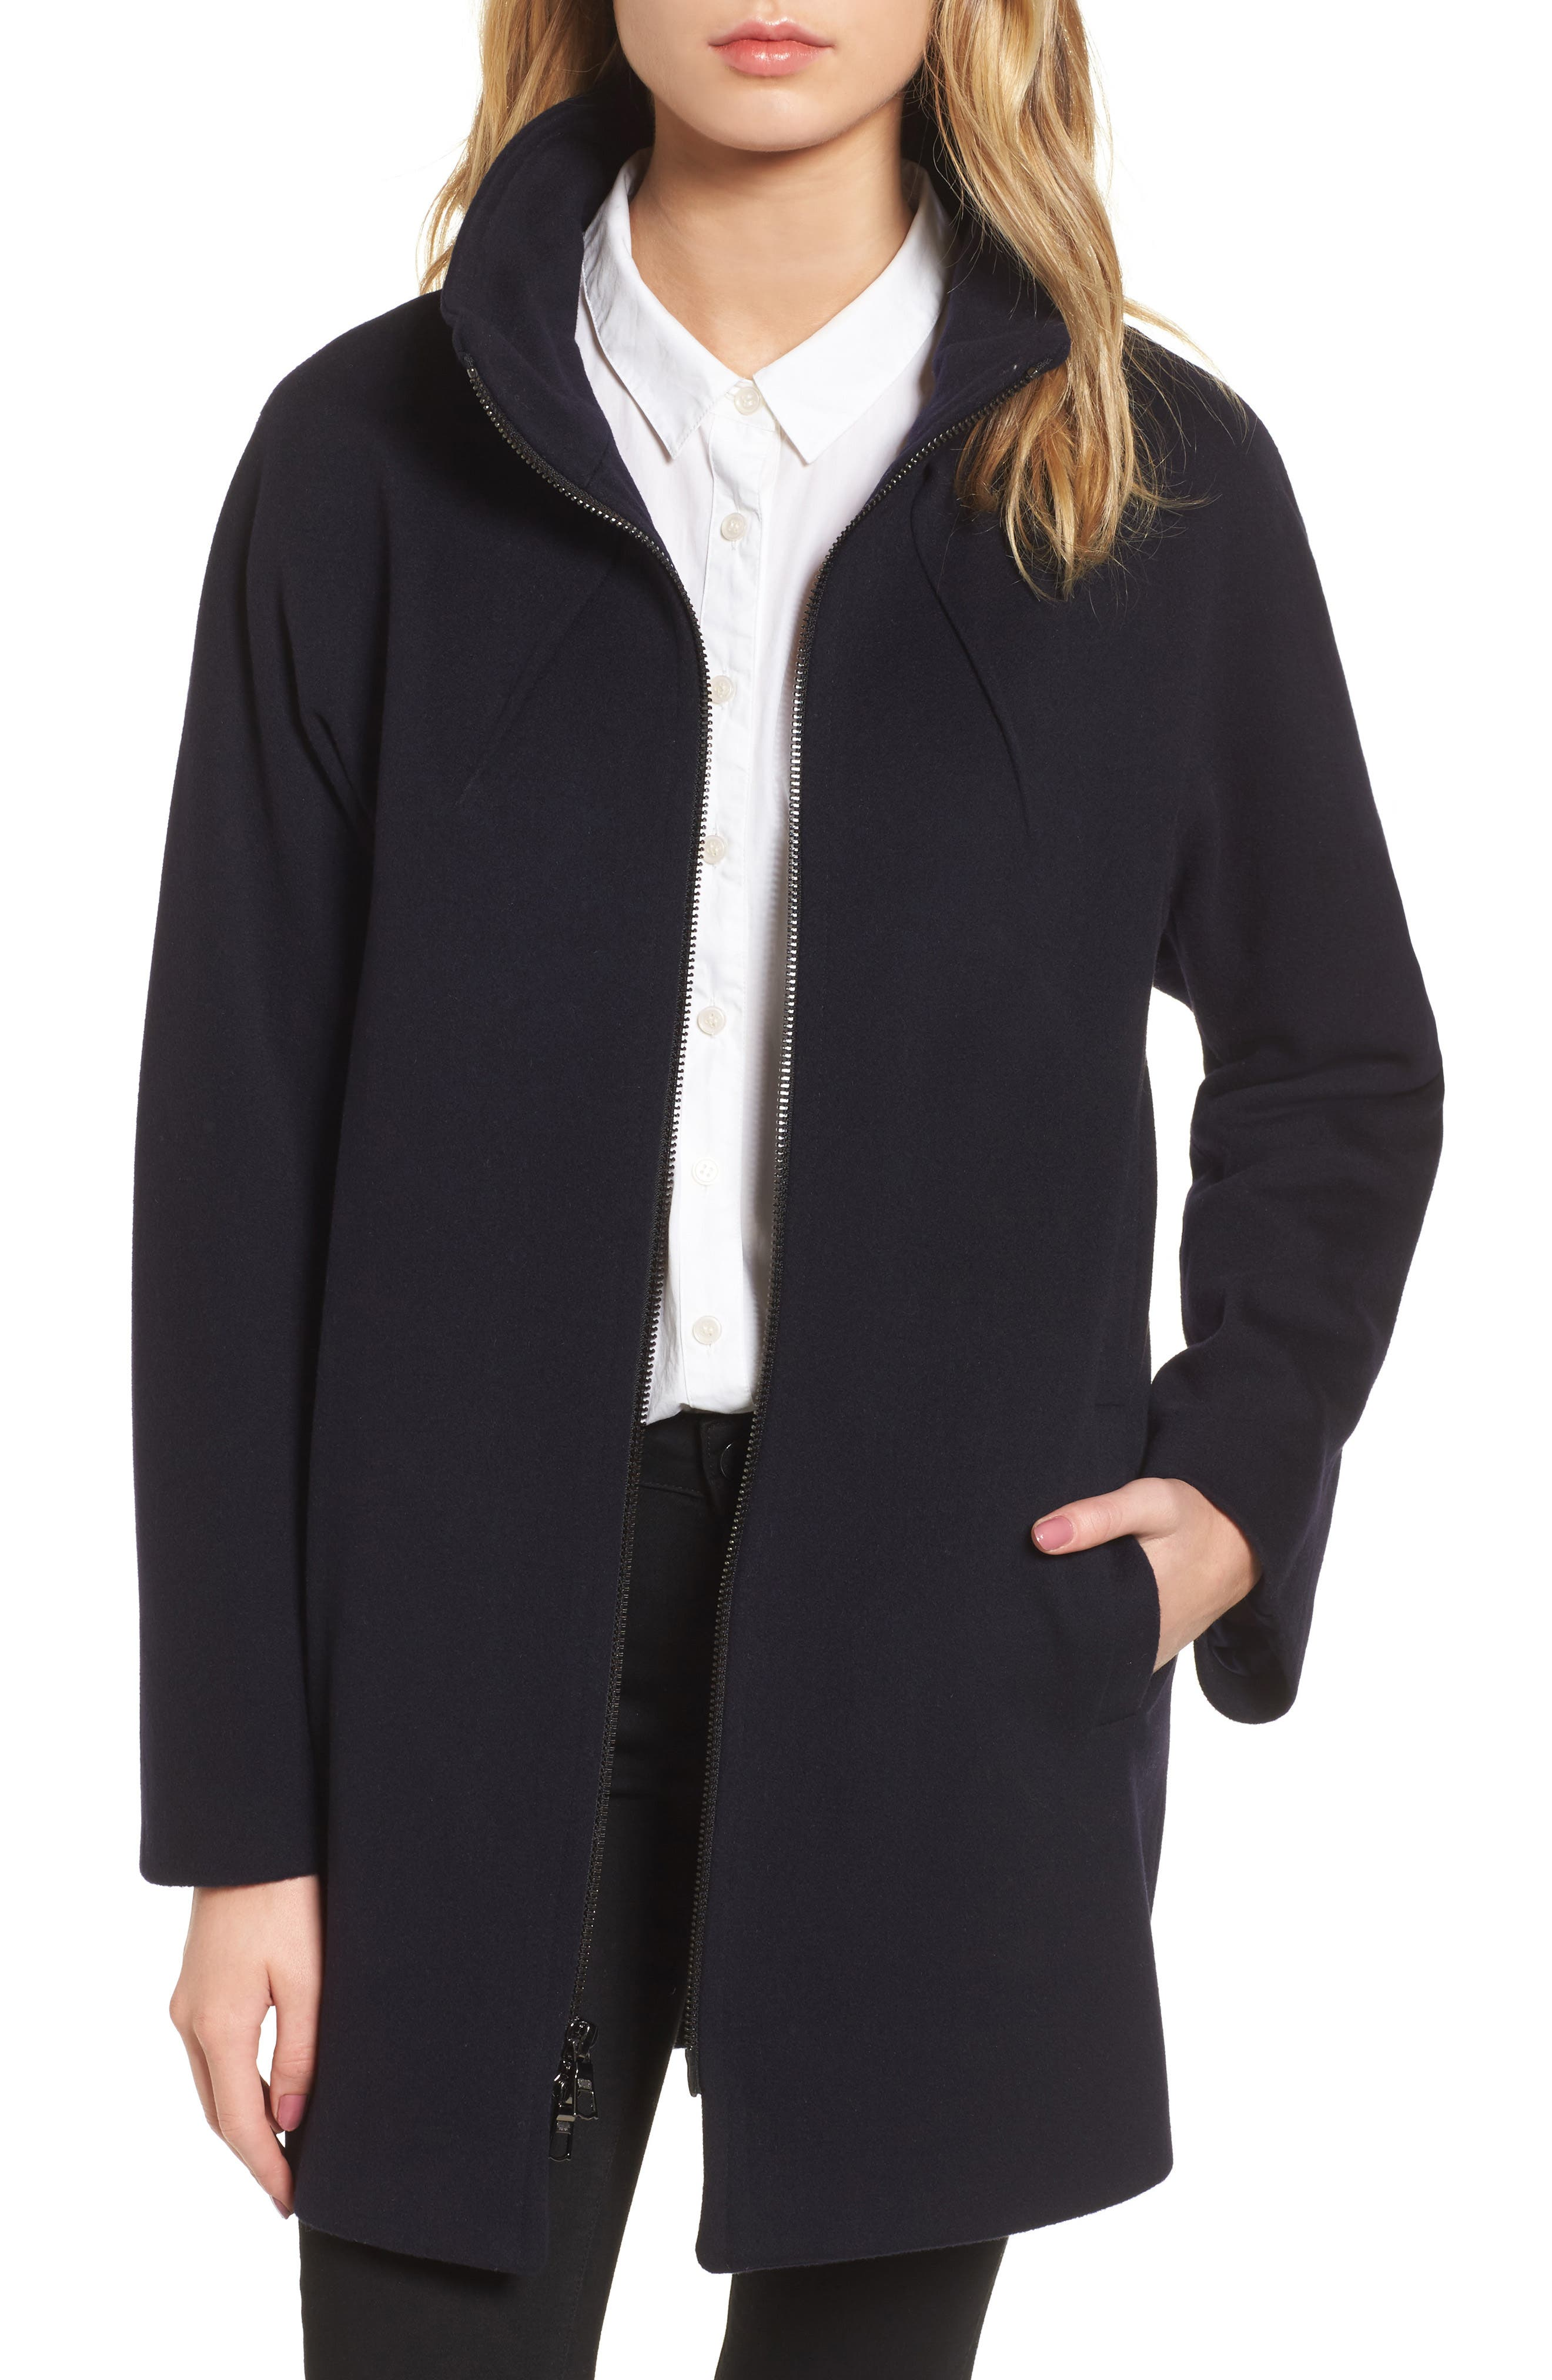 Sofia Cashmere Dolman Sleeve Coat